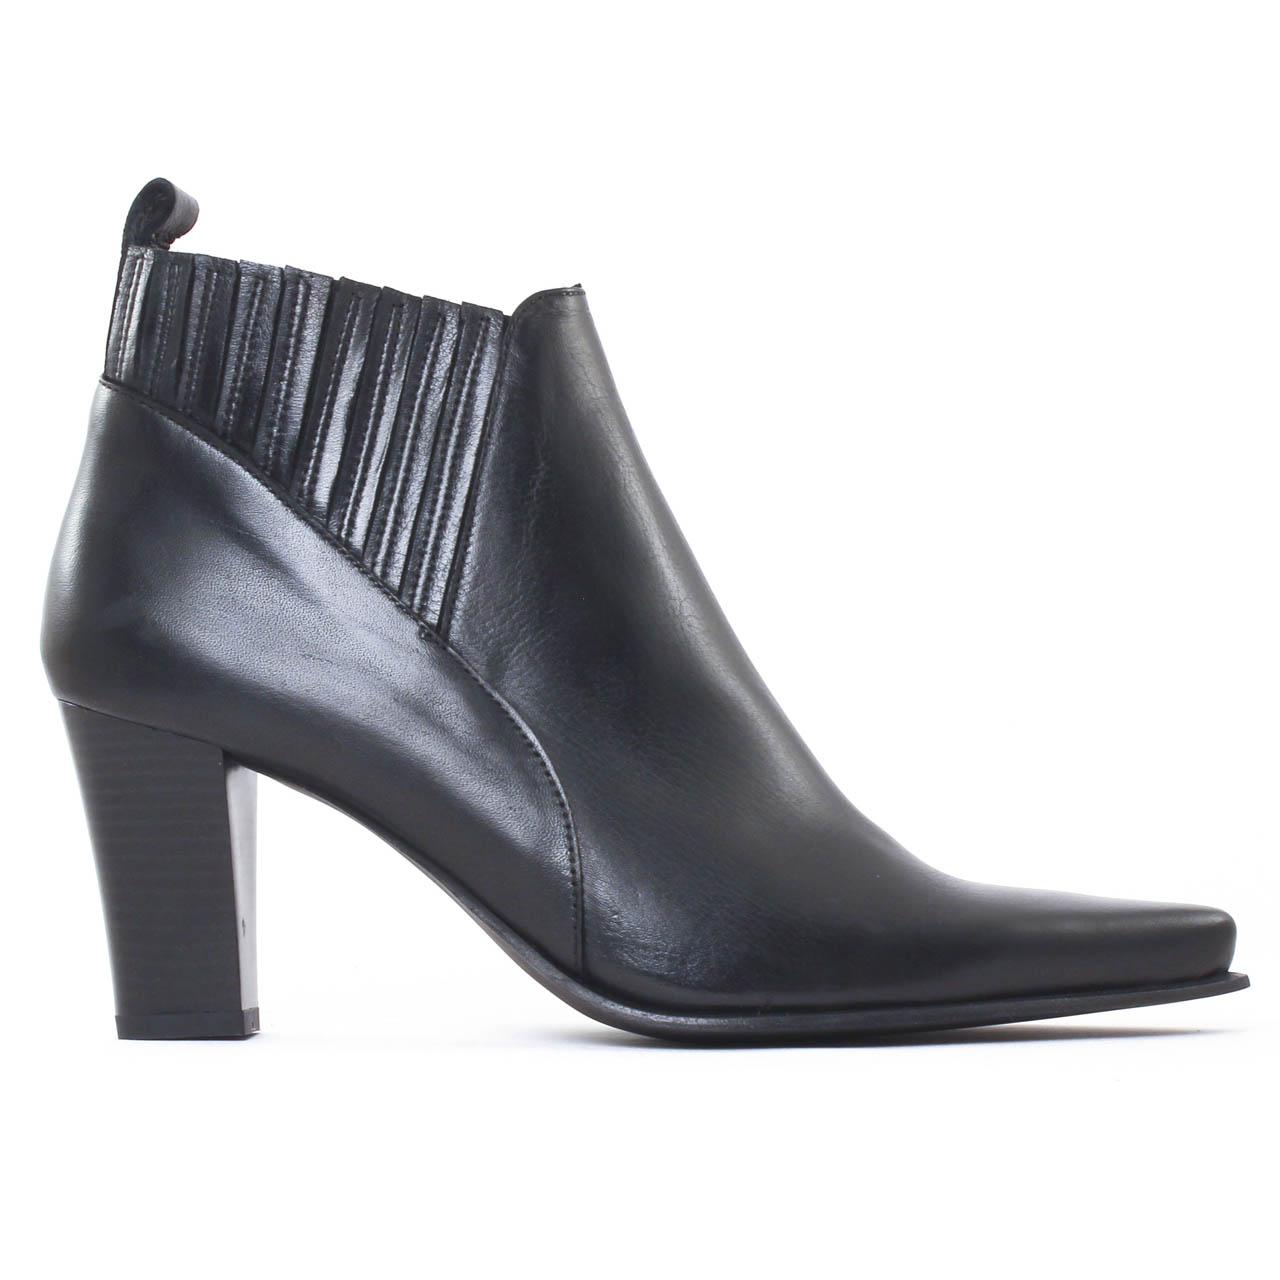 scarlatine fanet crust noir boot talon noir automne. Black Bedroom Furniture Sets. Home Design Ideas